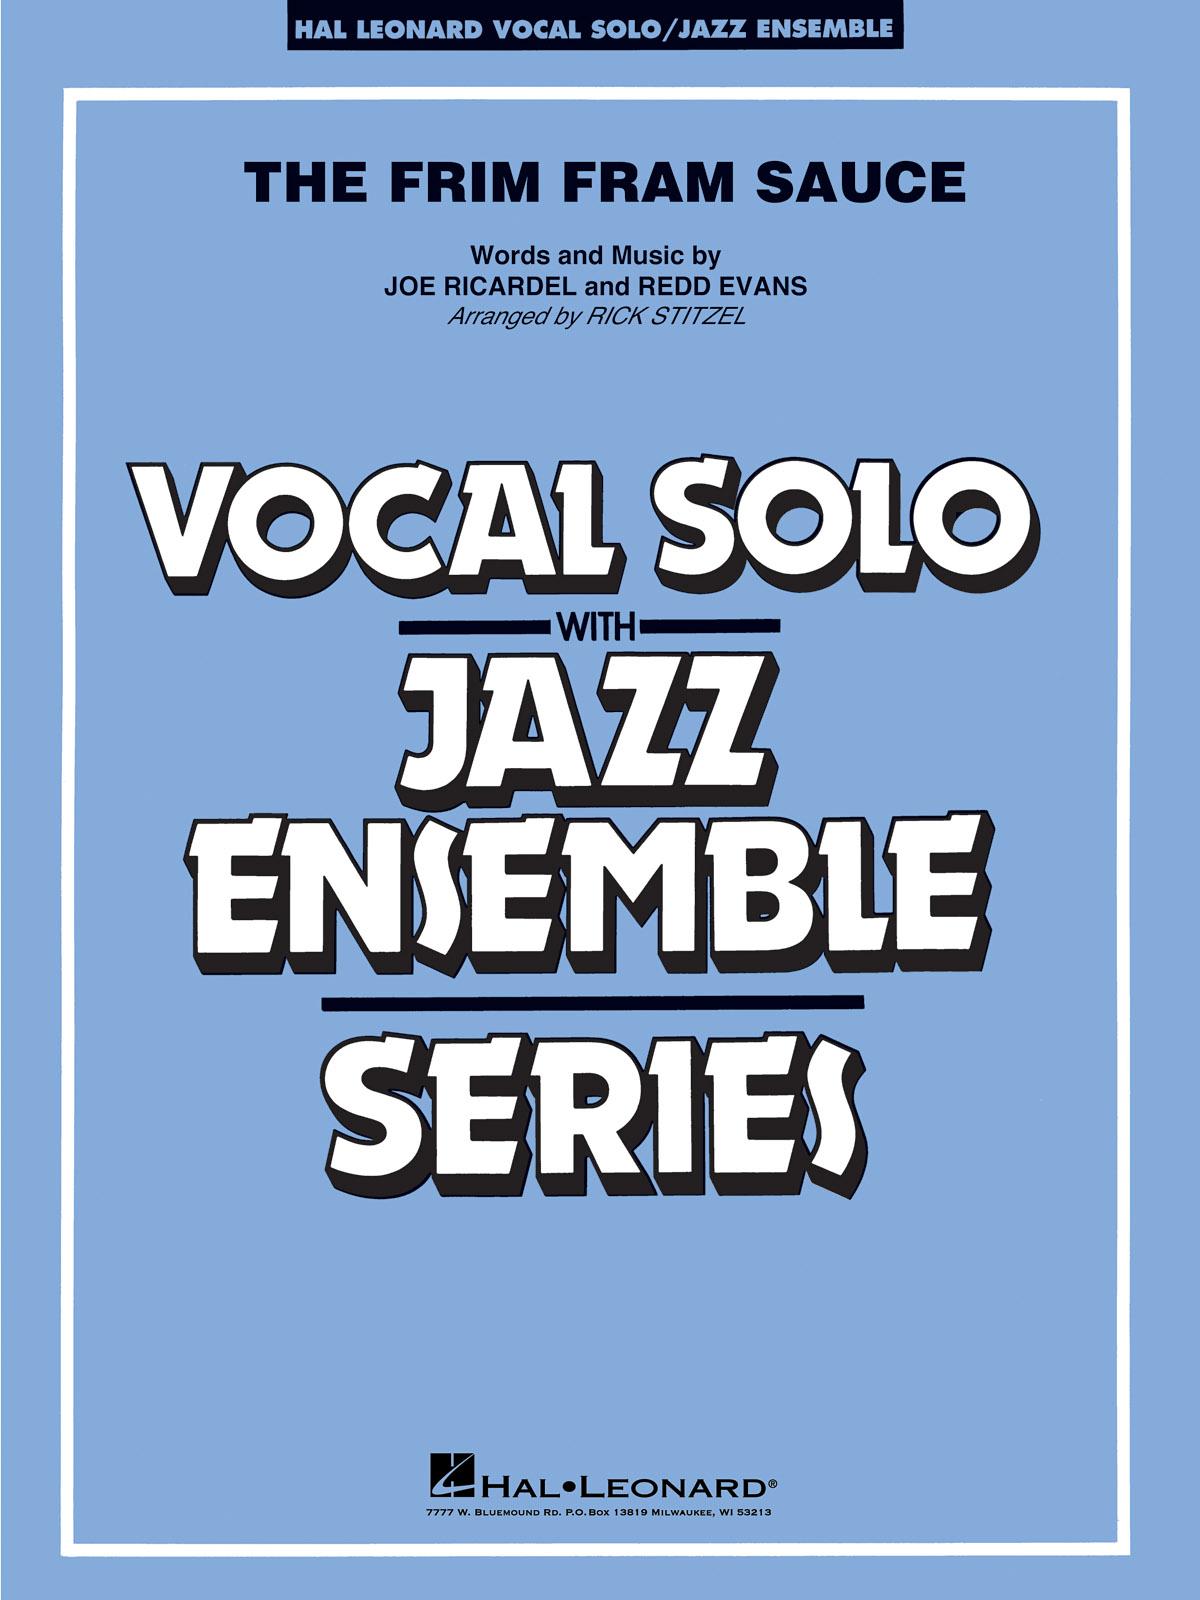 The Frim Fram Sauce - Vocal Solo / Jazz Ensemble Series